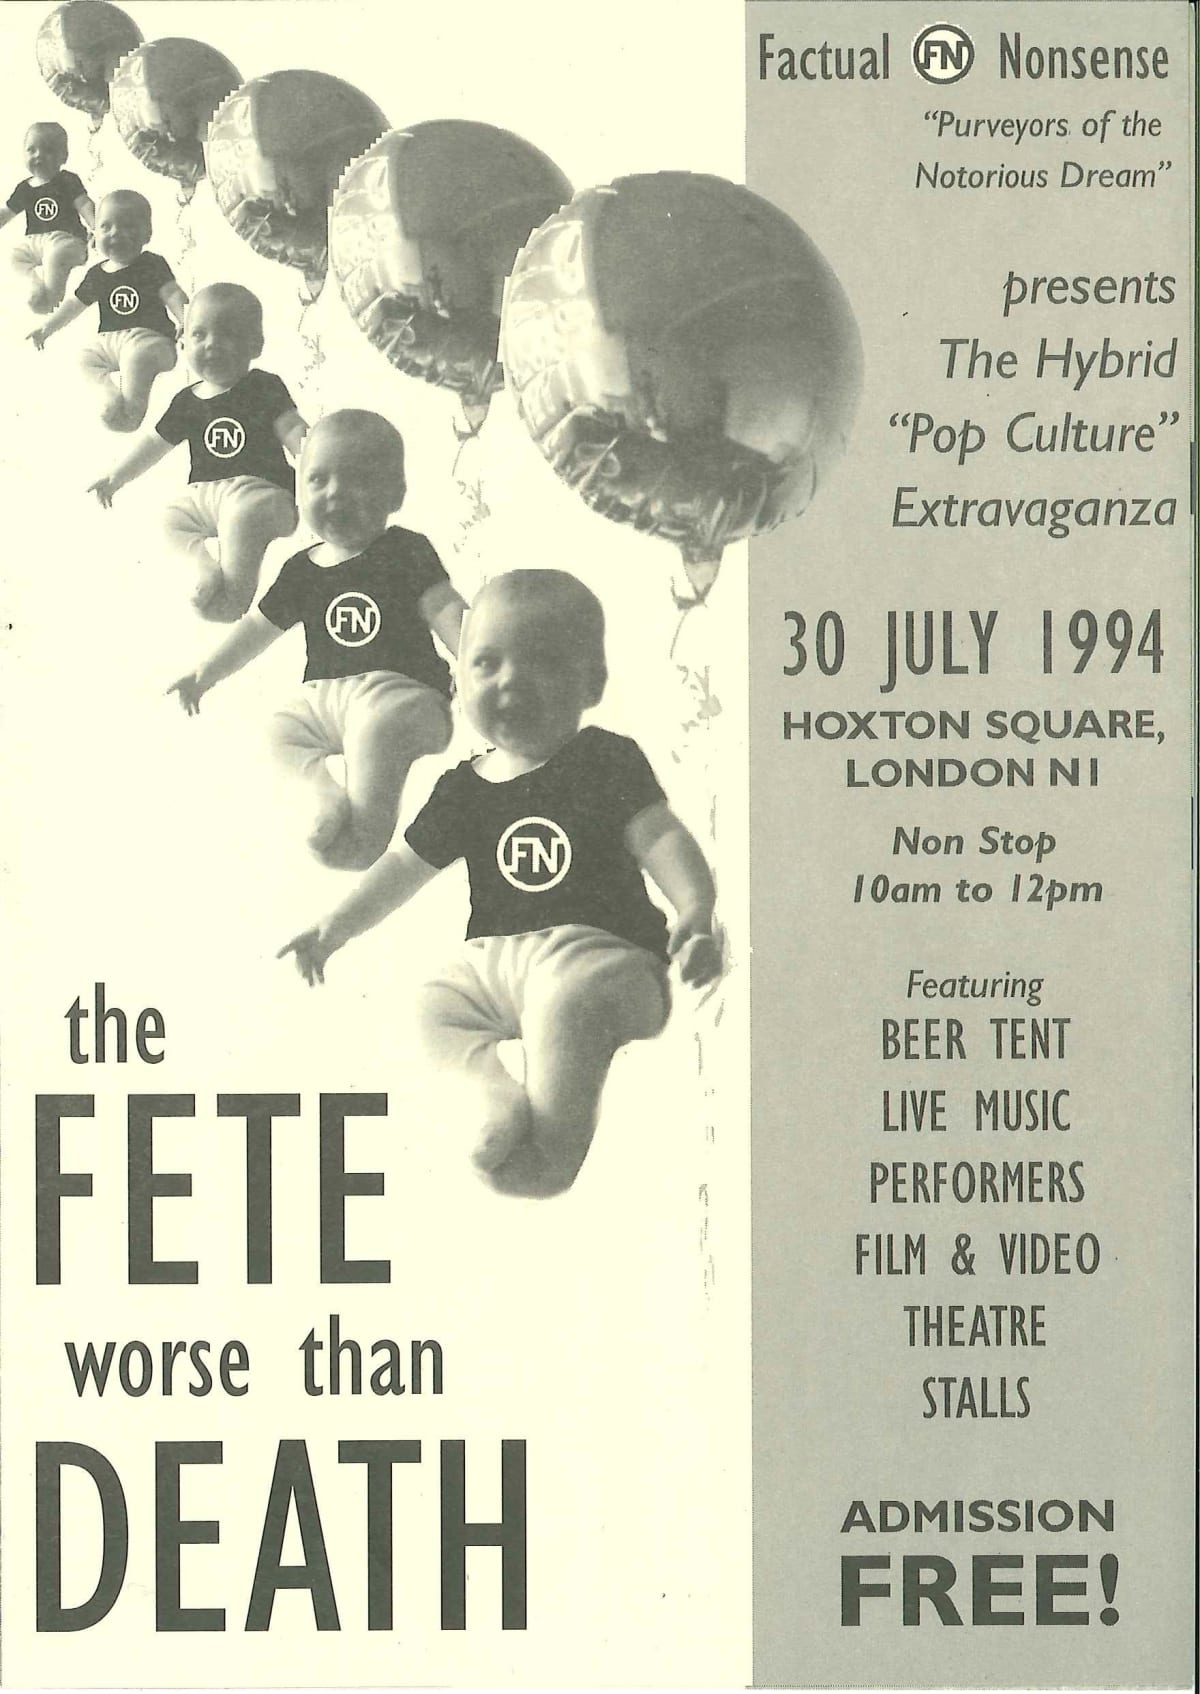 Factual Nonsense / Fete Worse Than Death pamphlet 1994 21 x 15 cm Edition of 3